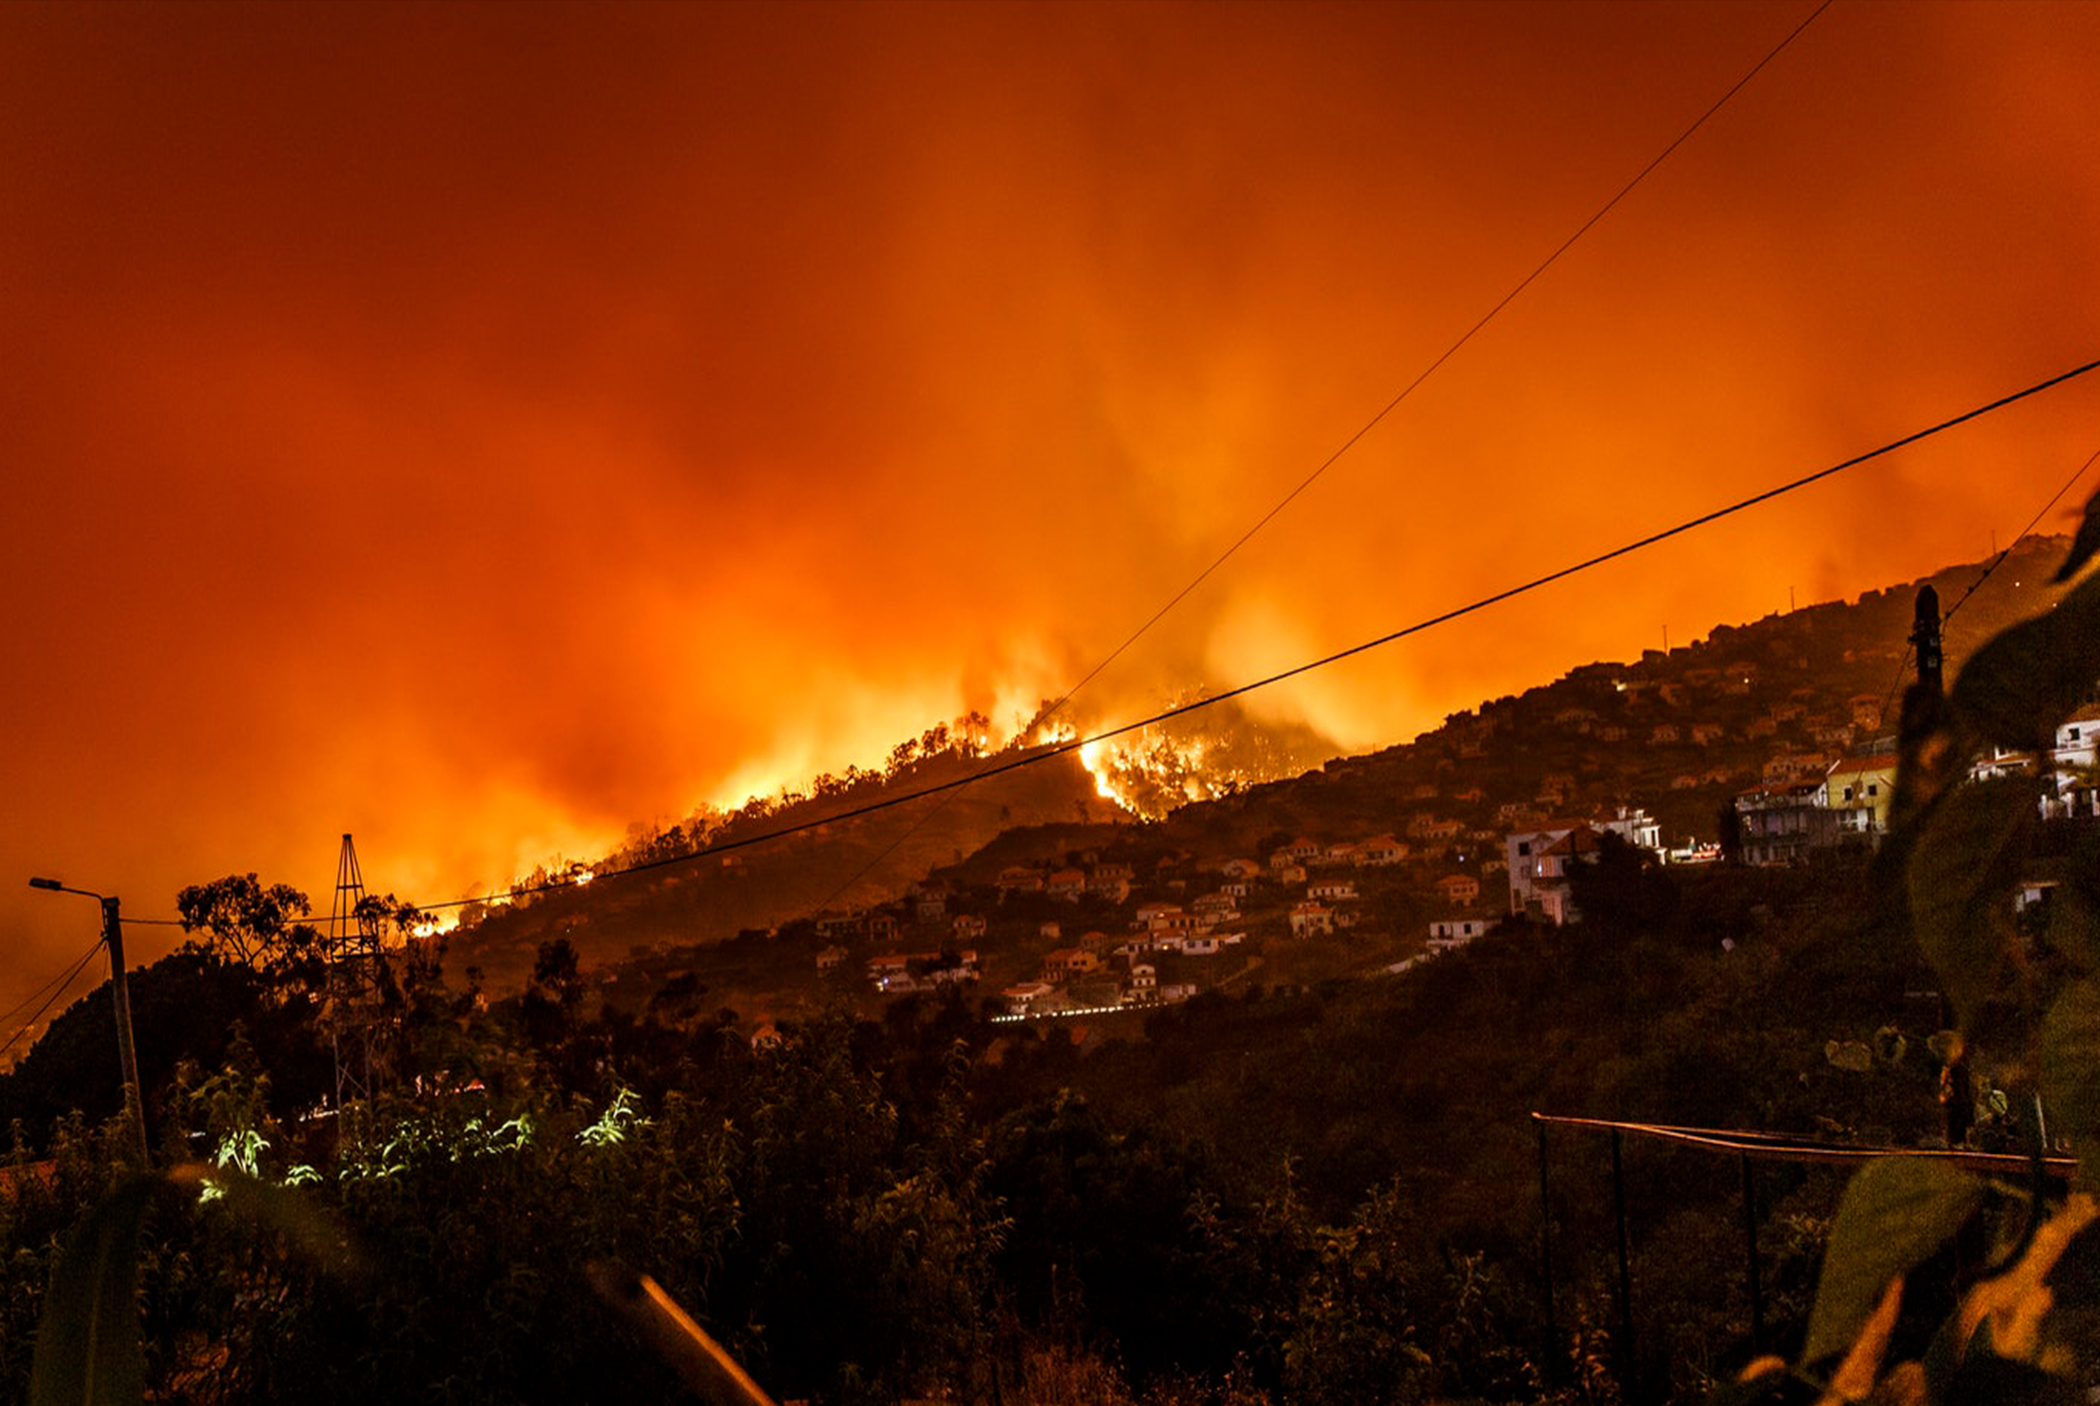 Disaster & Emergency